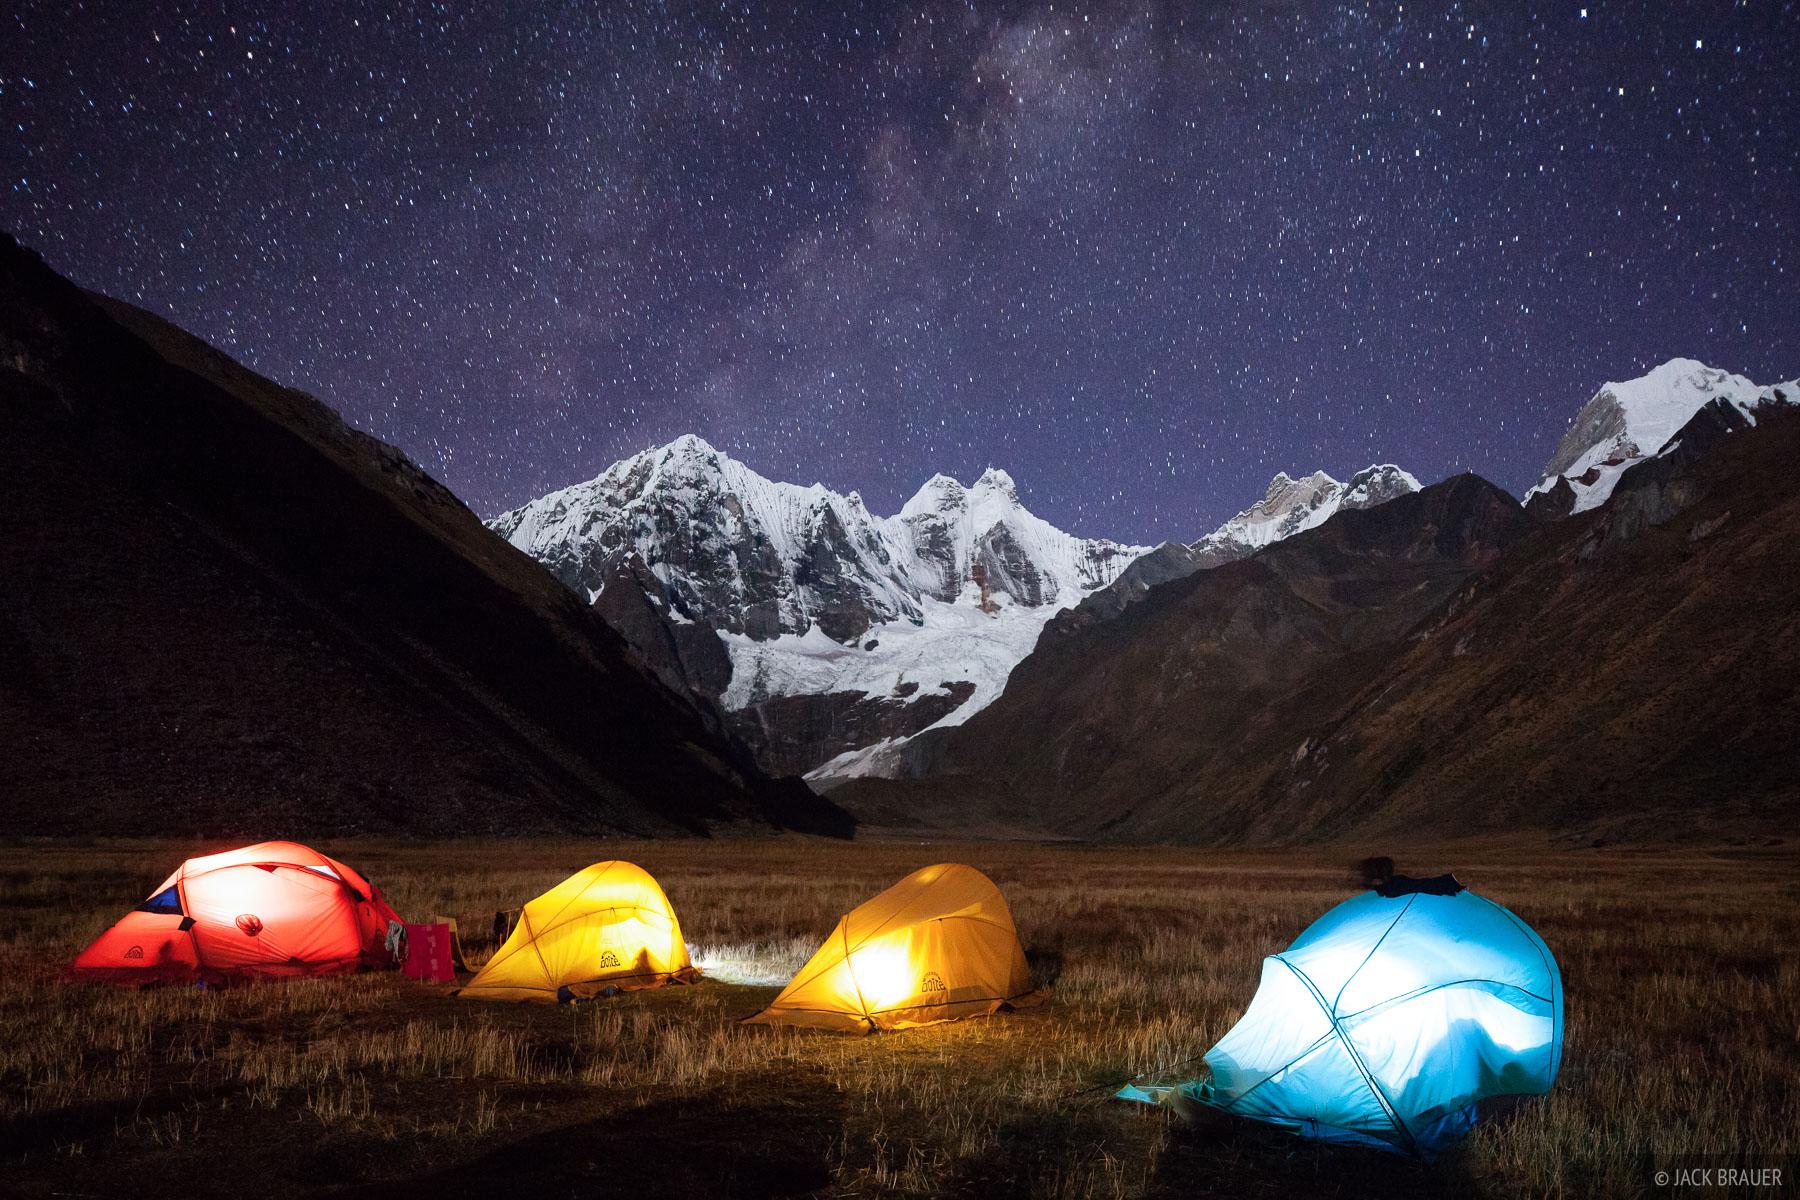 Colorful tents and nighttime stars at our camp below moonlit Jirishanca (6094m).